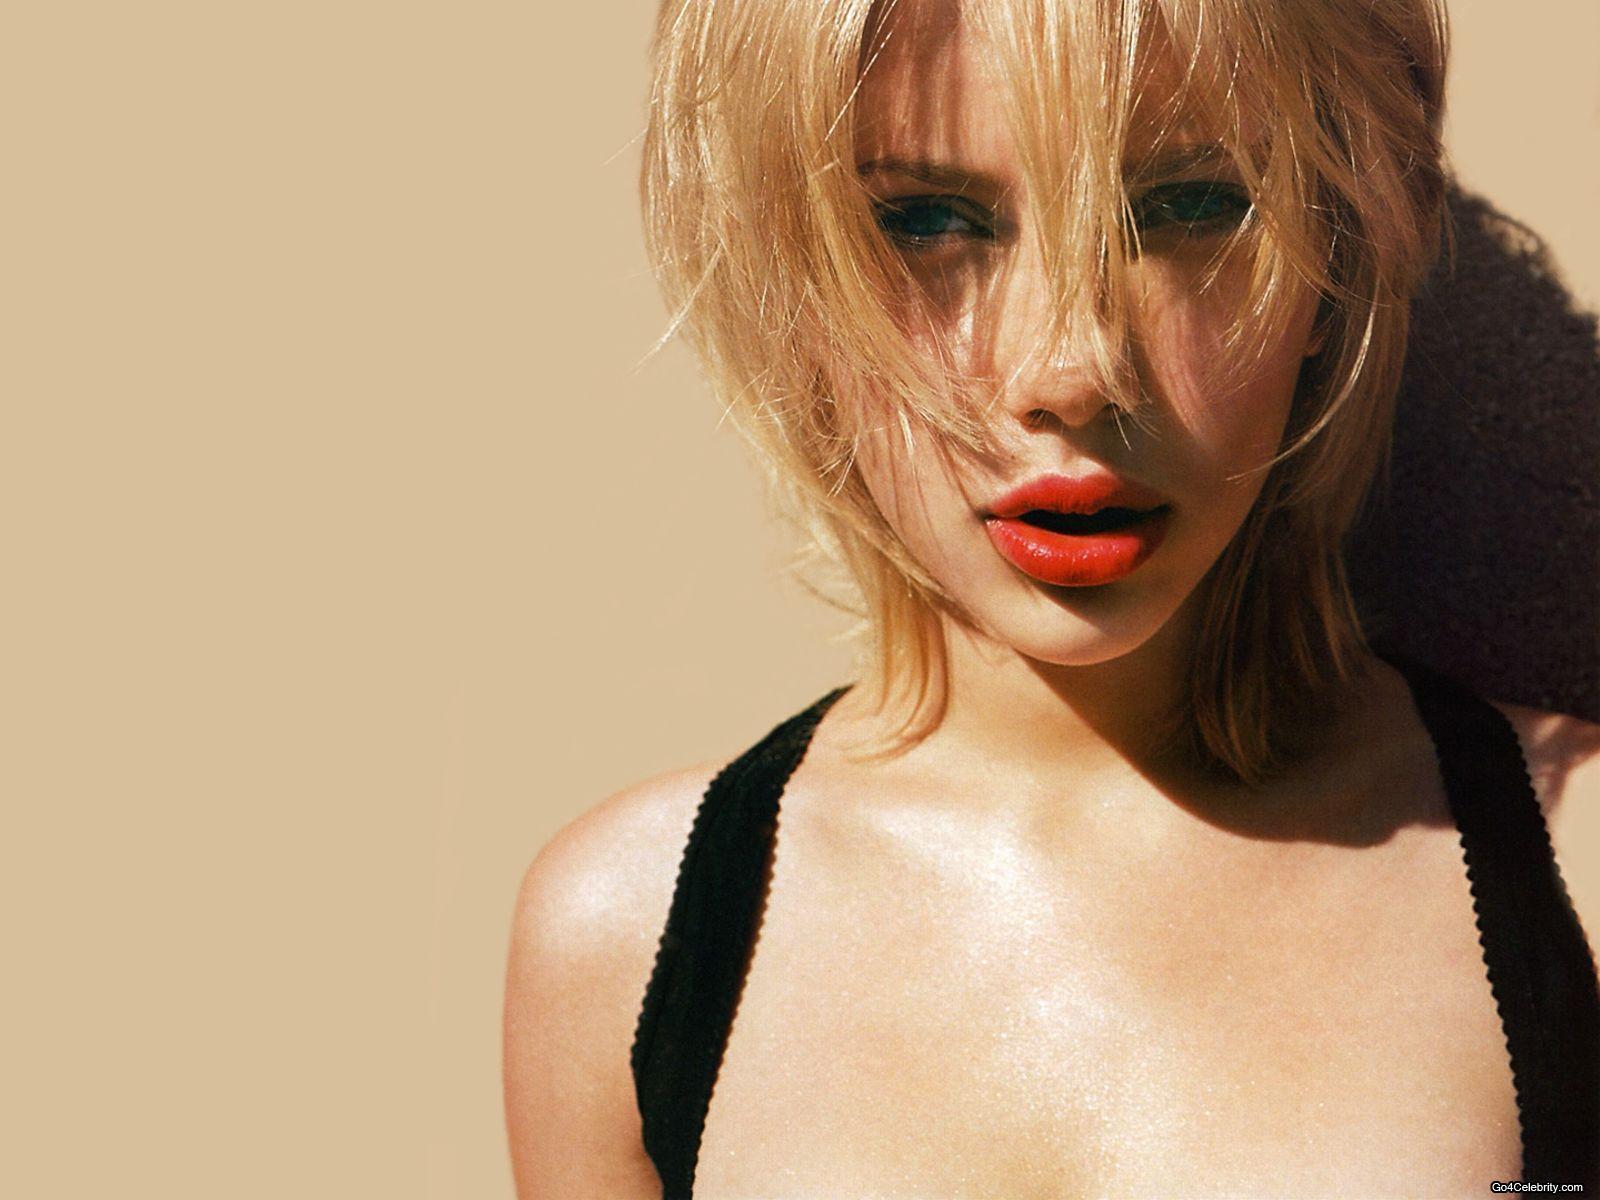 Scarlett Johansson Wallpaper HD Widescreem For Your PC Computer